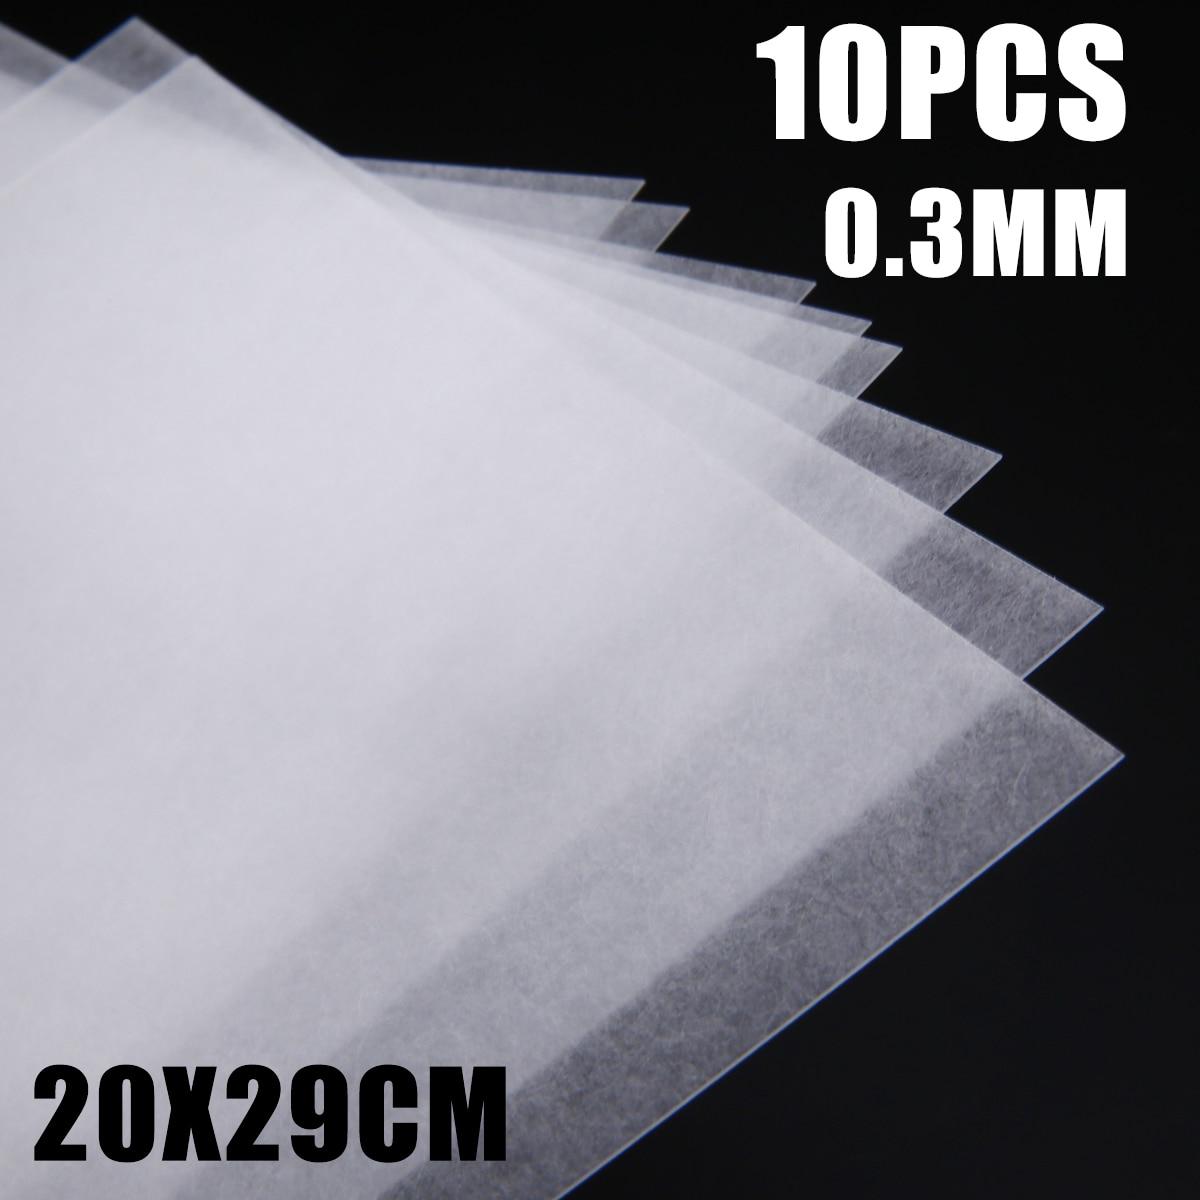 10pcs/set Translucent Heat Shrink Film Sheets Scrapbooking Paper DIY Jewelry Making Craft Decor Cards Rough Polish Board